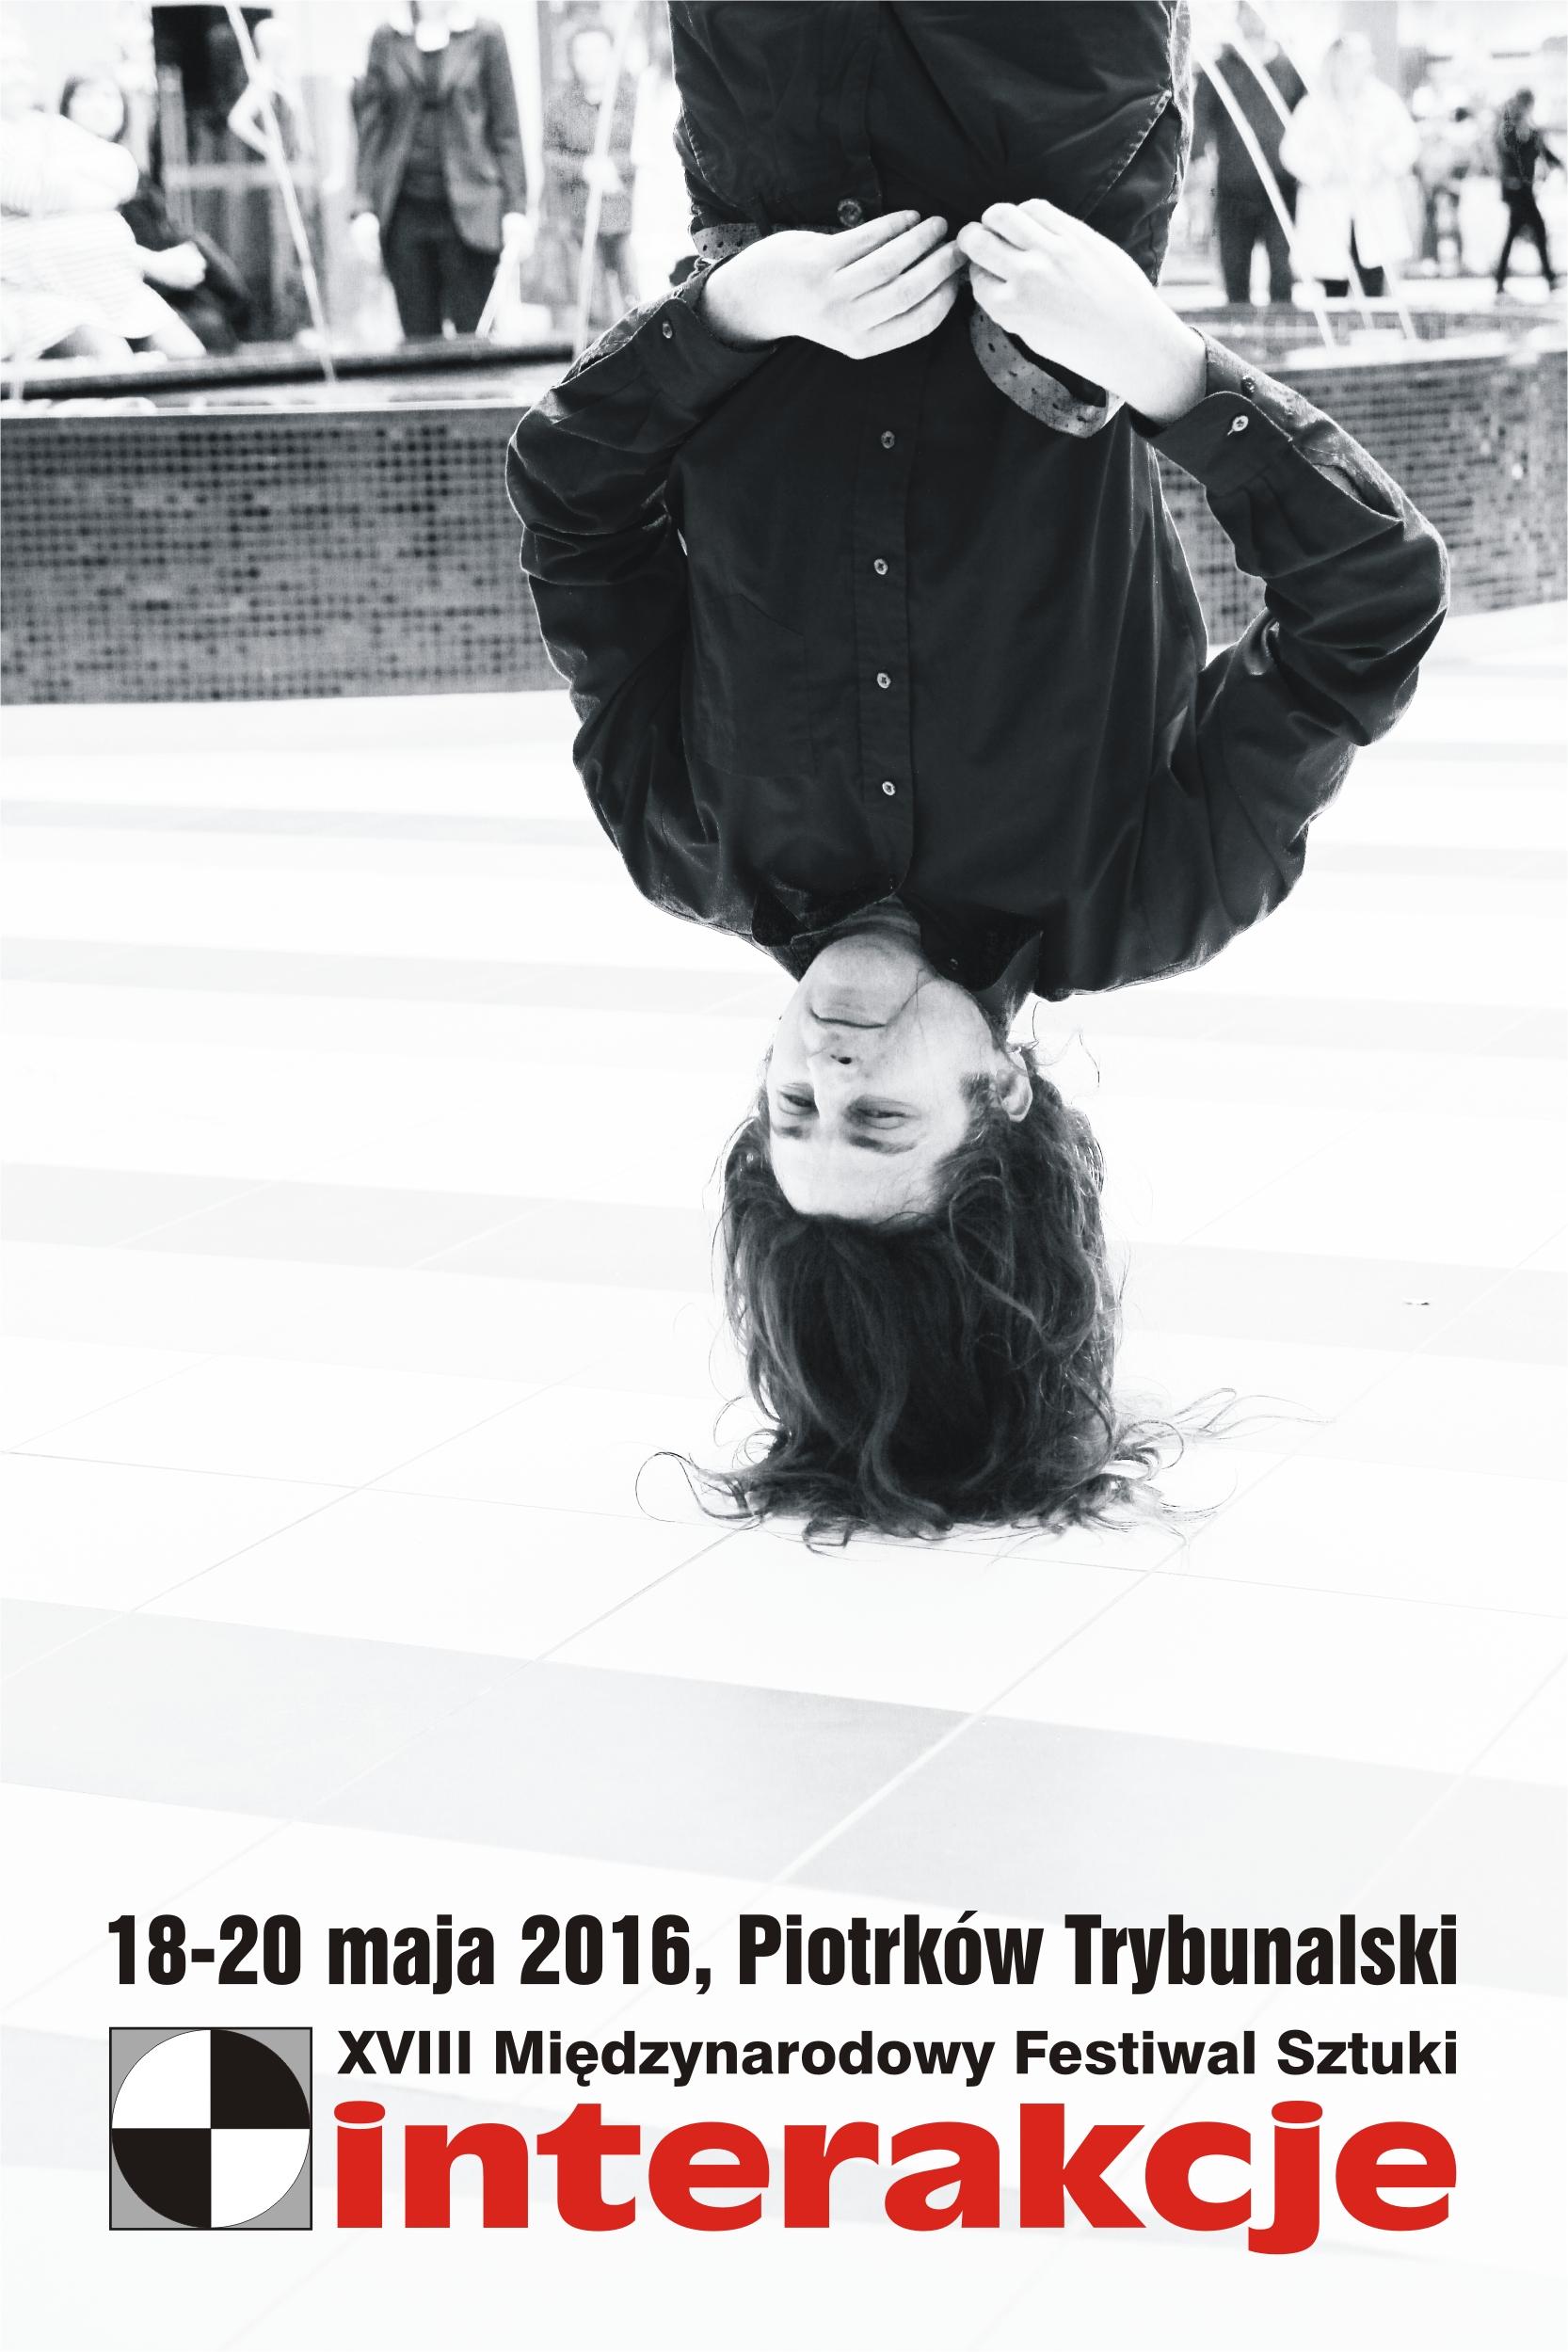 interakcje 2016 poster